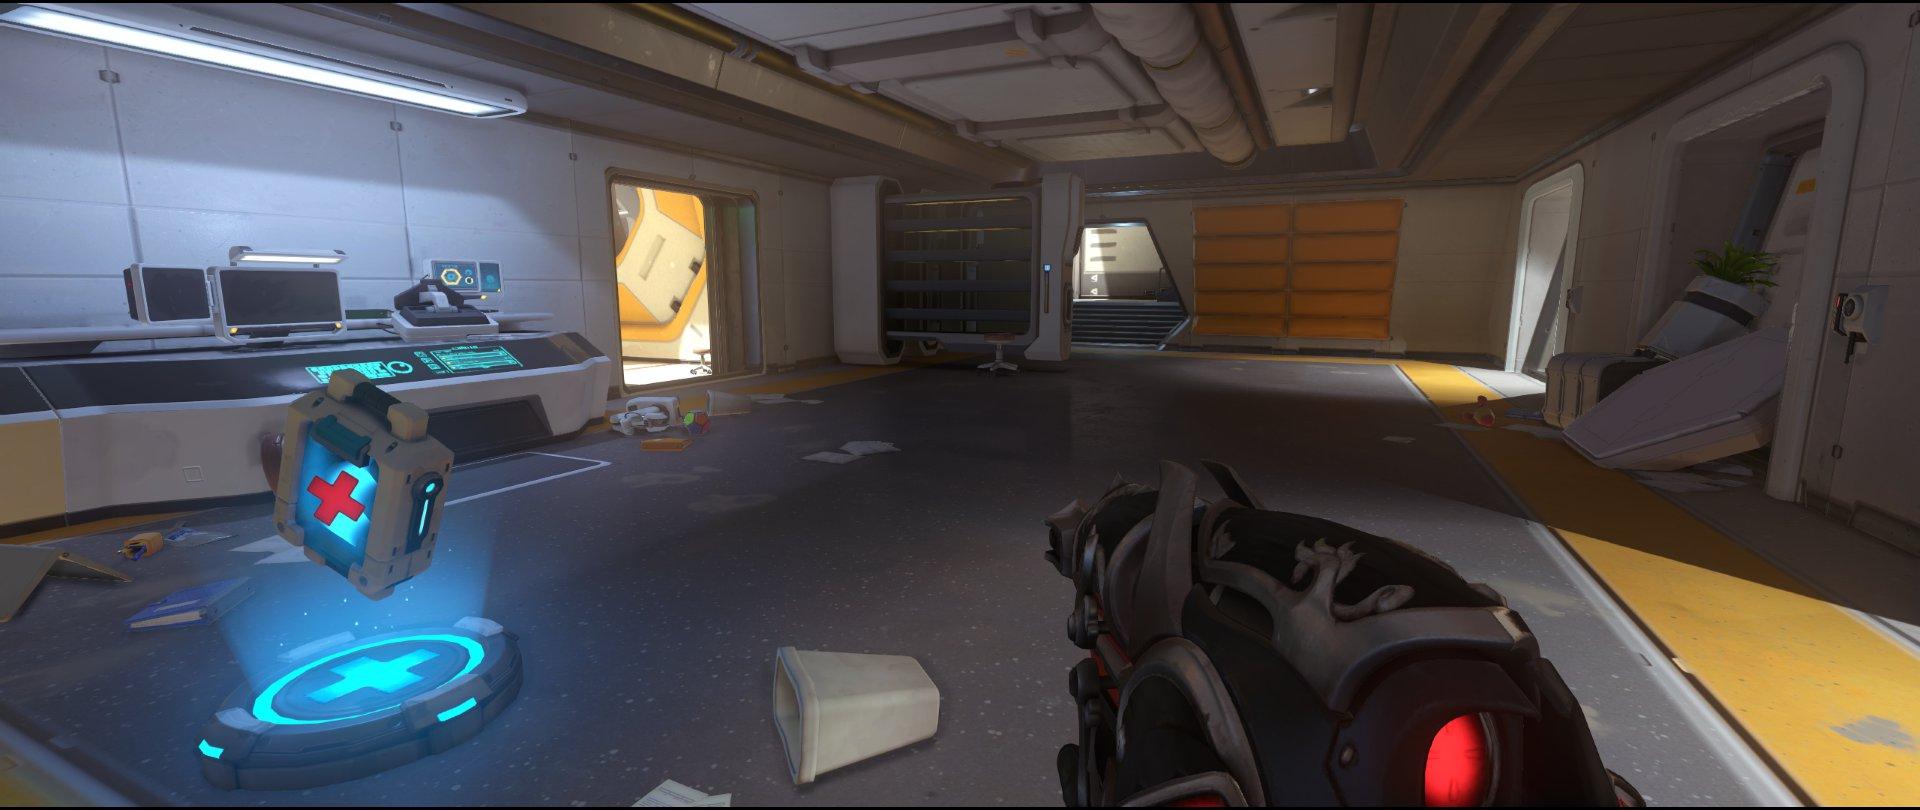 Flankroom+attack+sniping+spot+Widowmaker+Horizon+Lunar+Colony+Overwatch